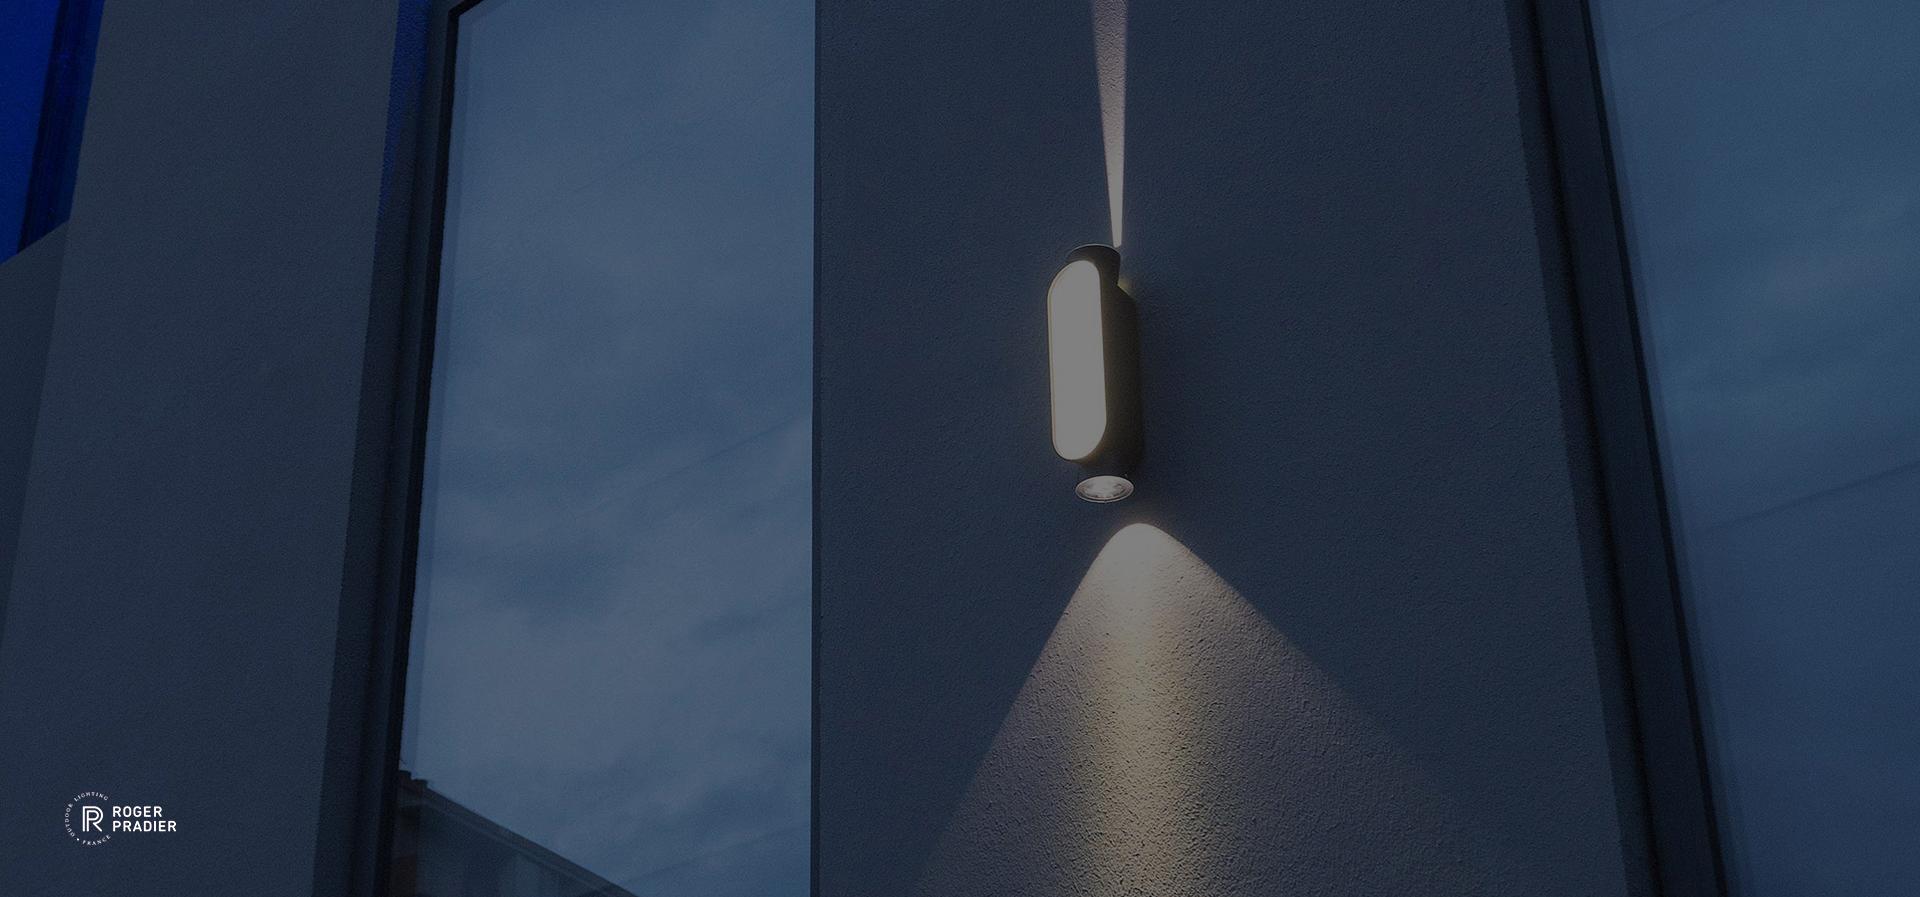 LED lighting France, choisissez la performance - CisLED